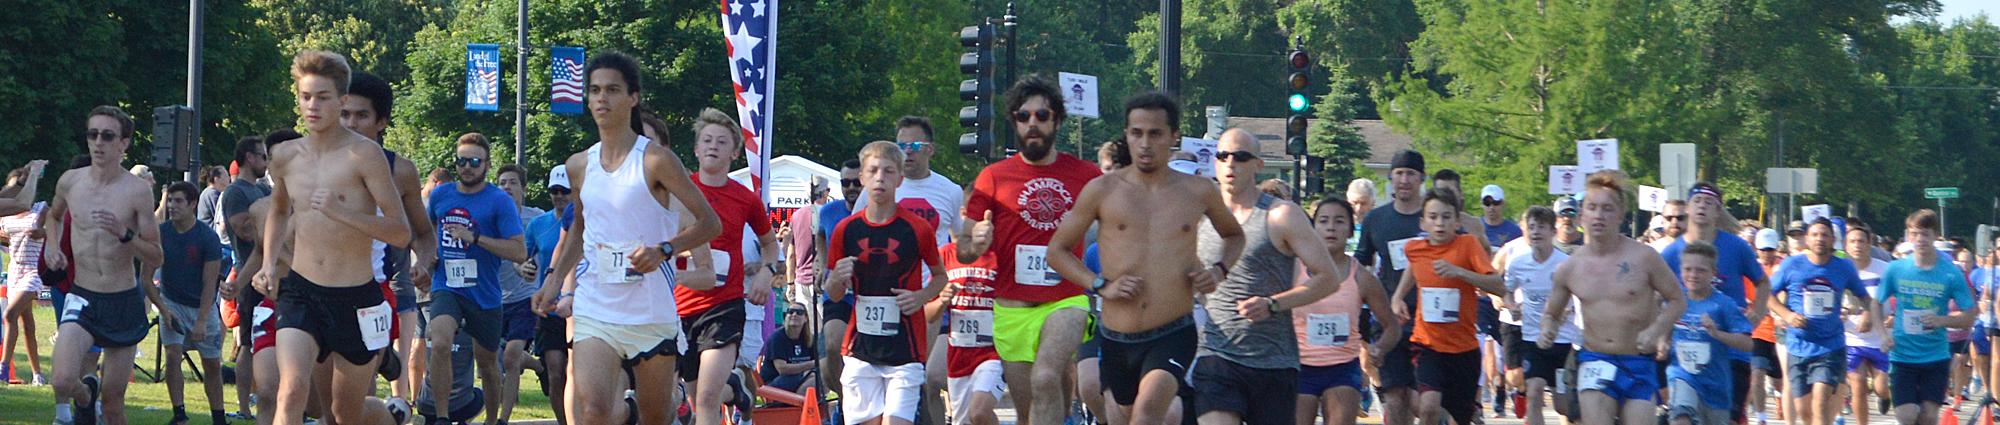 Photo of Freedom Classic runners